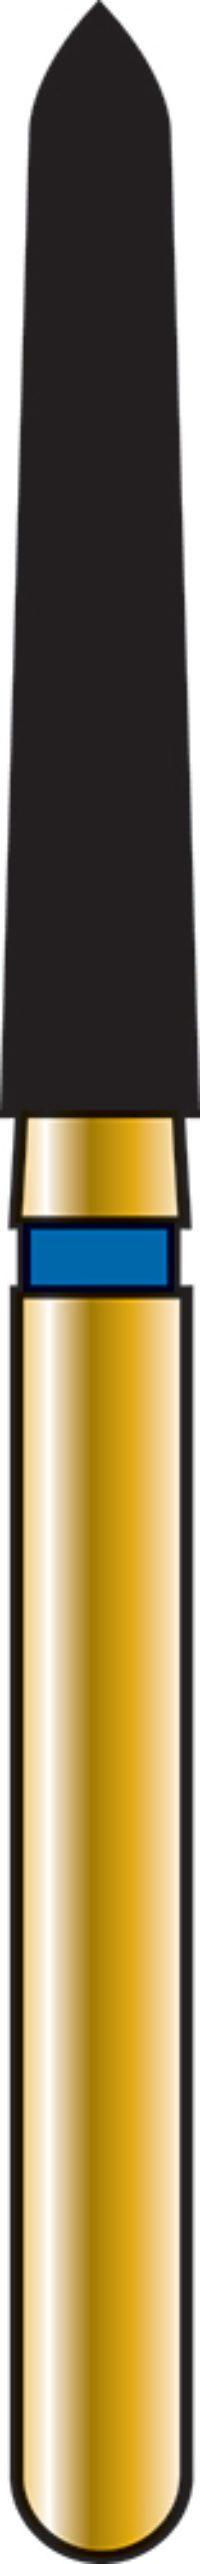 Pointed Taper 18-10mm Gold Diamond Bur